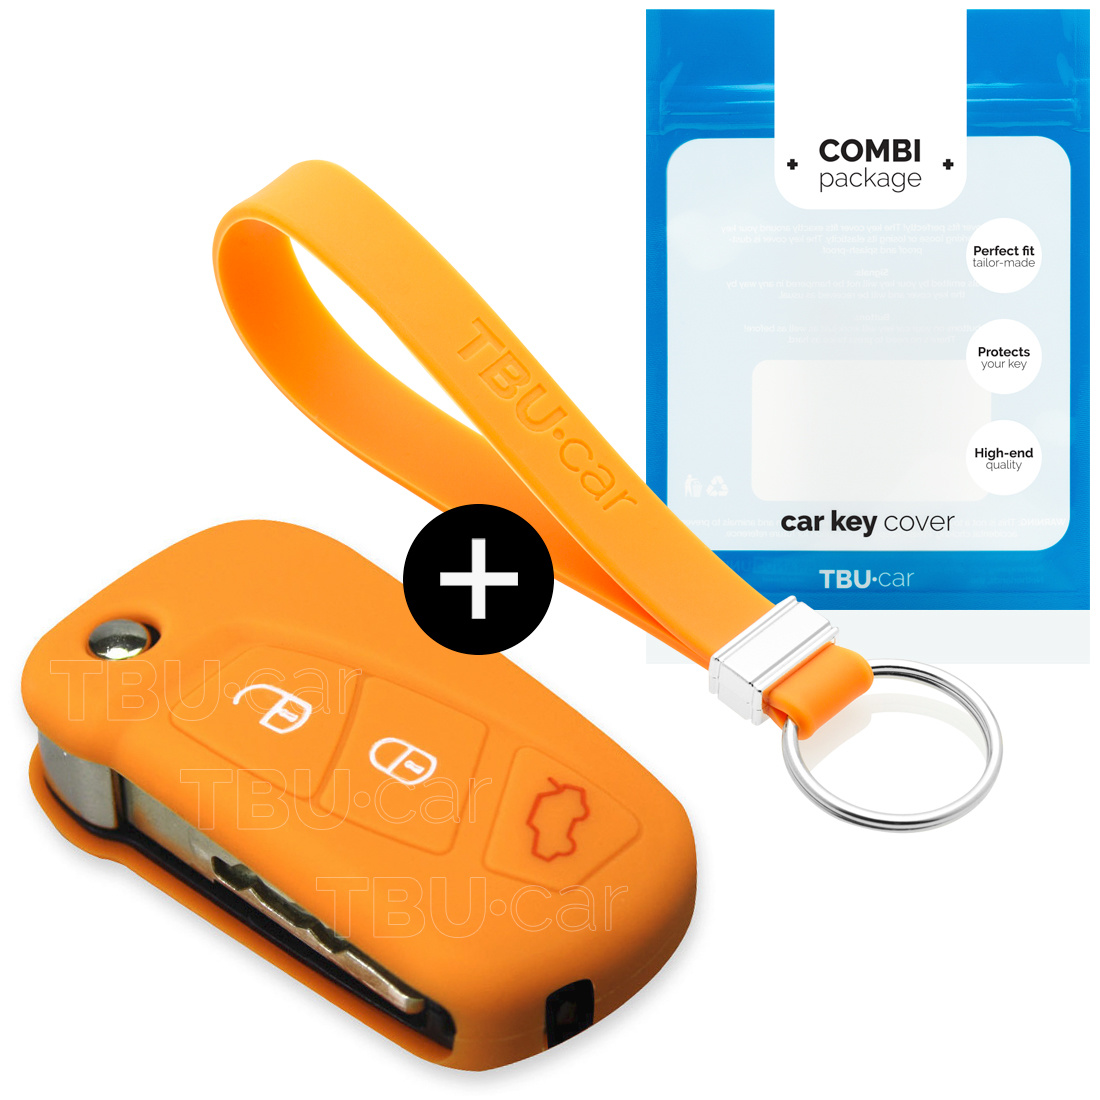 TBU car TBU car Autoschlüssel Hülle kompatibel mit Ford 3 Tasten (KA) - Schutzhülle aus Silikon - Auto Schlüsselhülle Cover in Orange